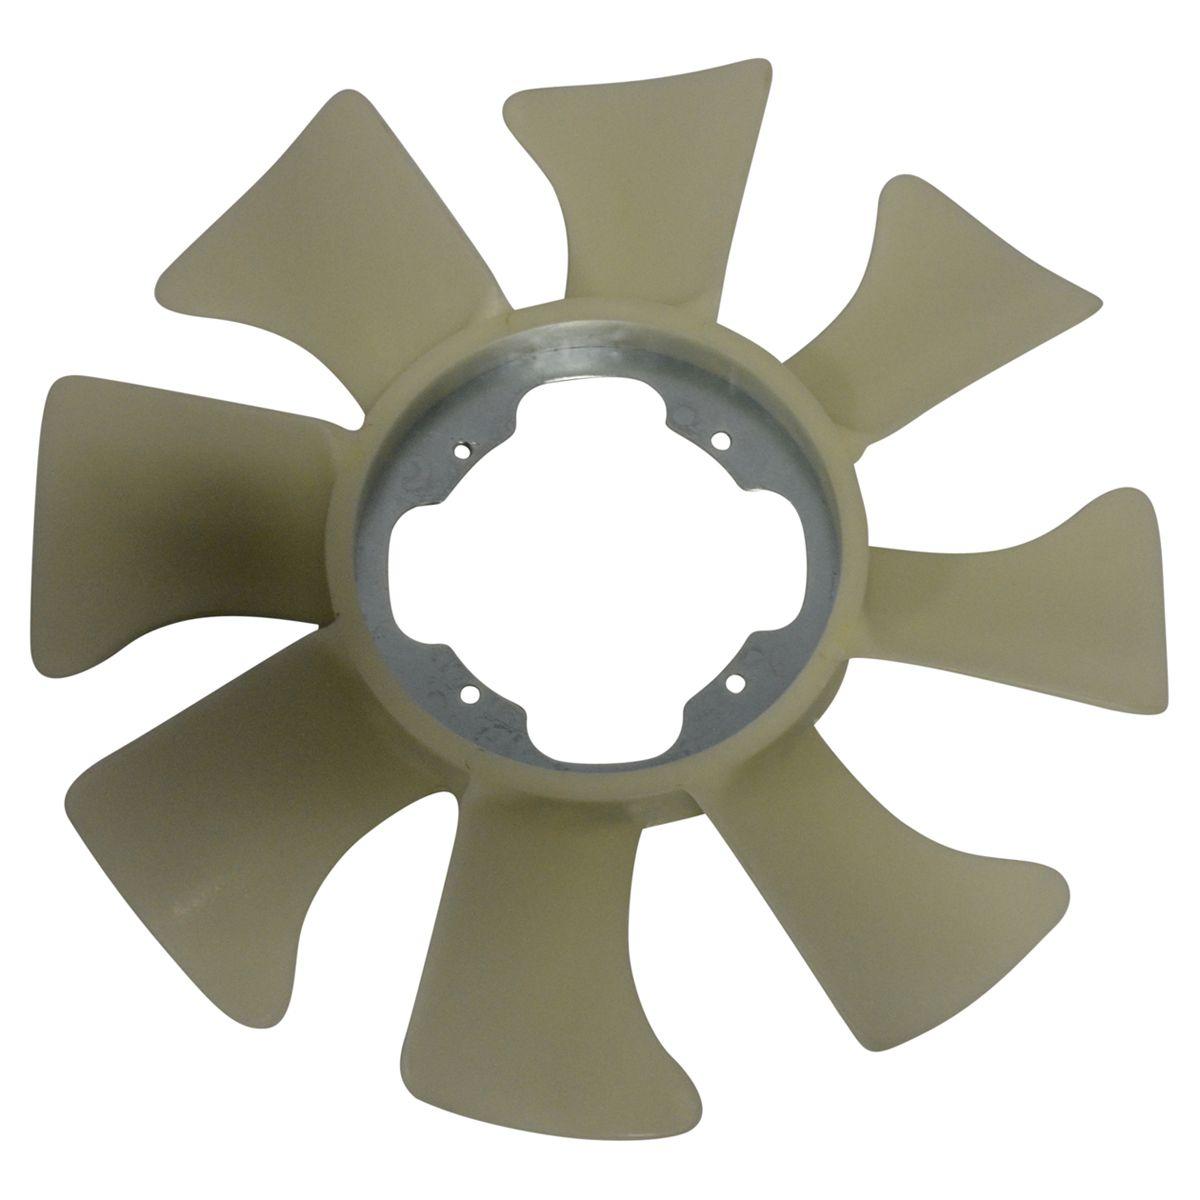 2.4L Engine For Nissan Xterra Fan Blade 2000 01 02 03 2004 325-50278 2106086G0A NI3112125